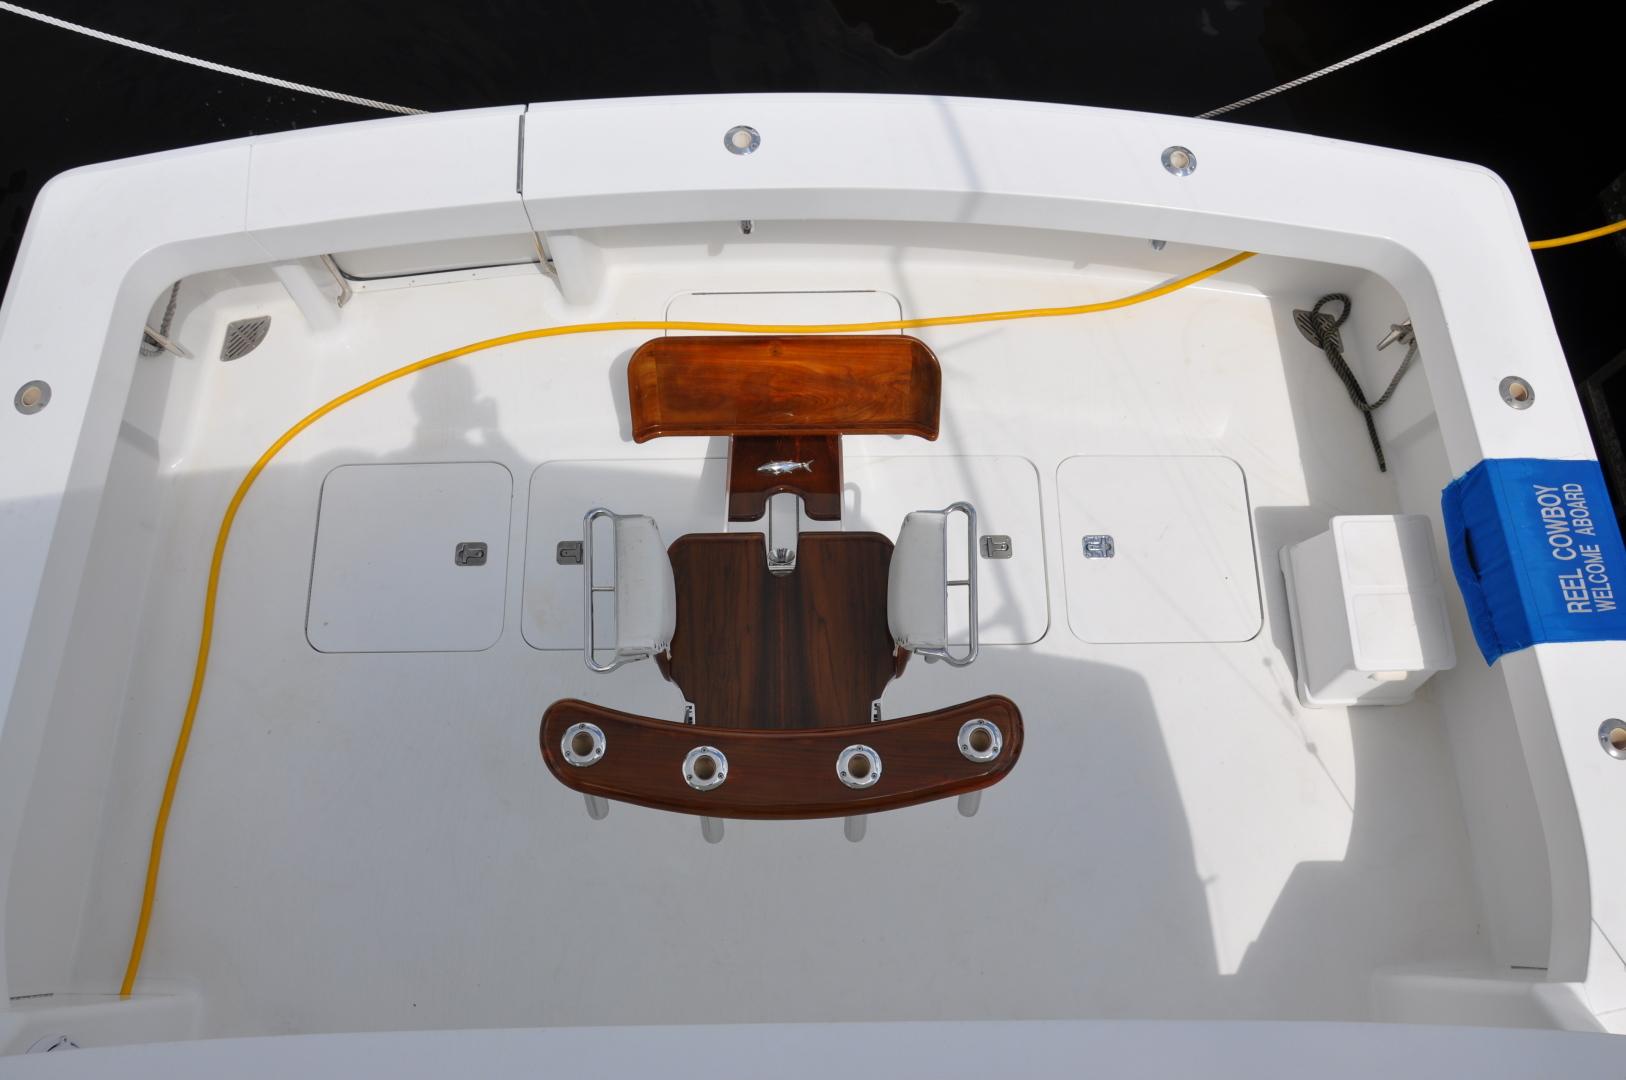 Viking-Convertible 2003-Reel Cowboy Deerfield Beach-Florida-United States-Cockpit-1546880 | Thumbnail